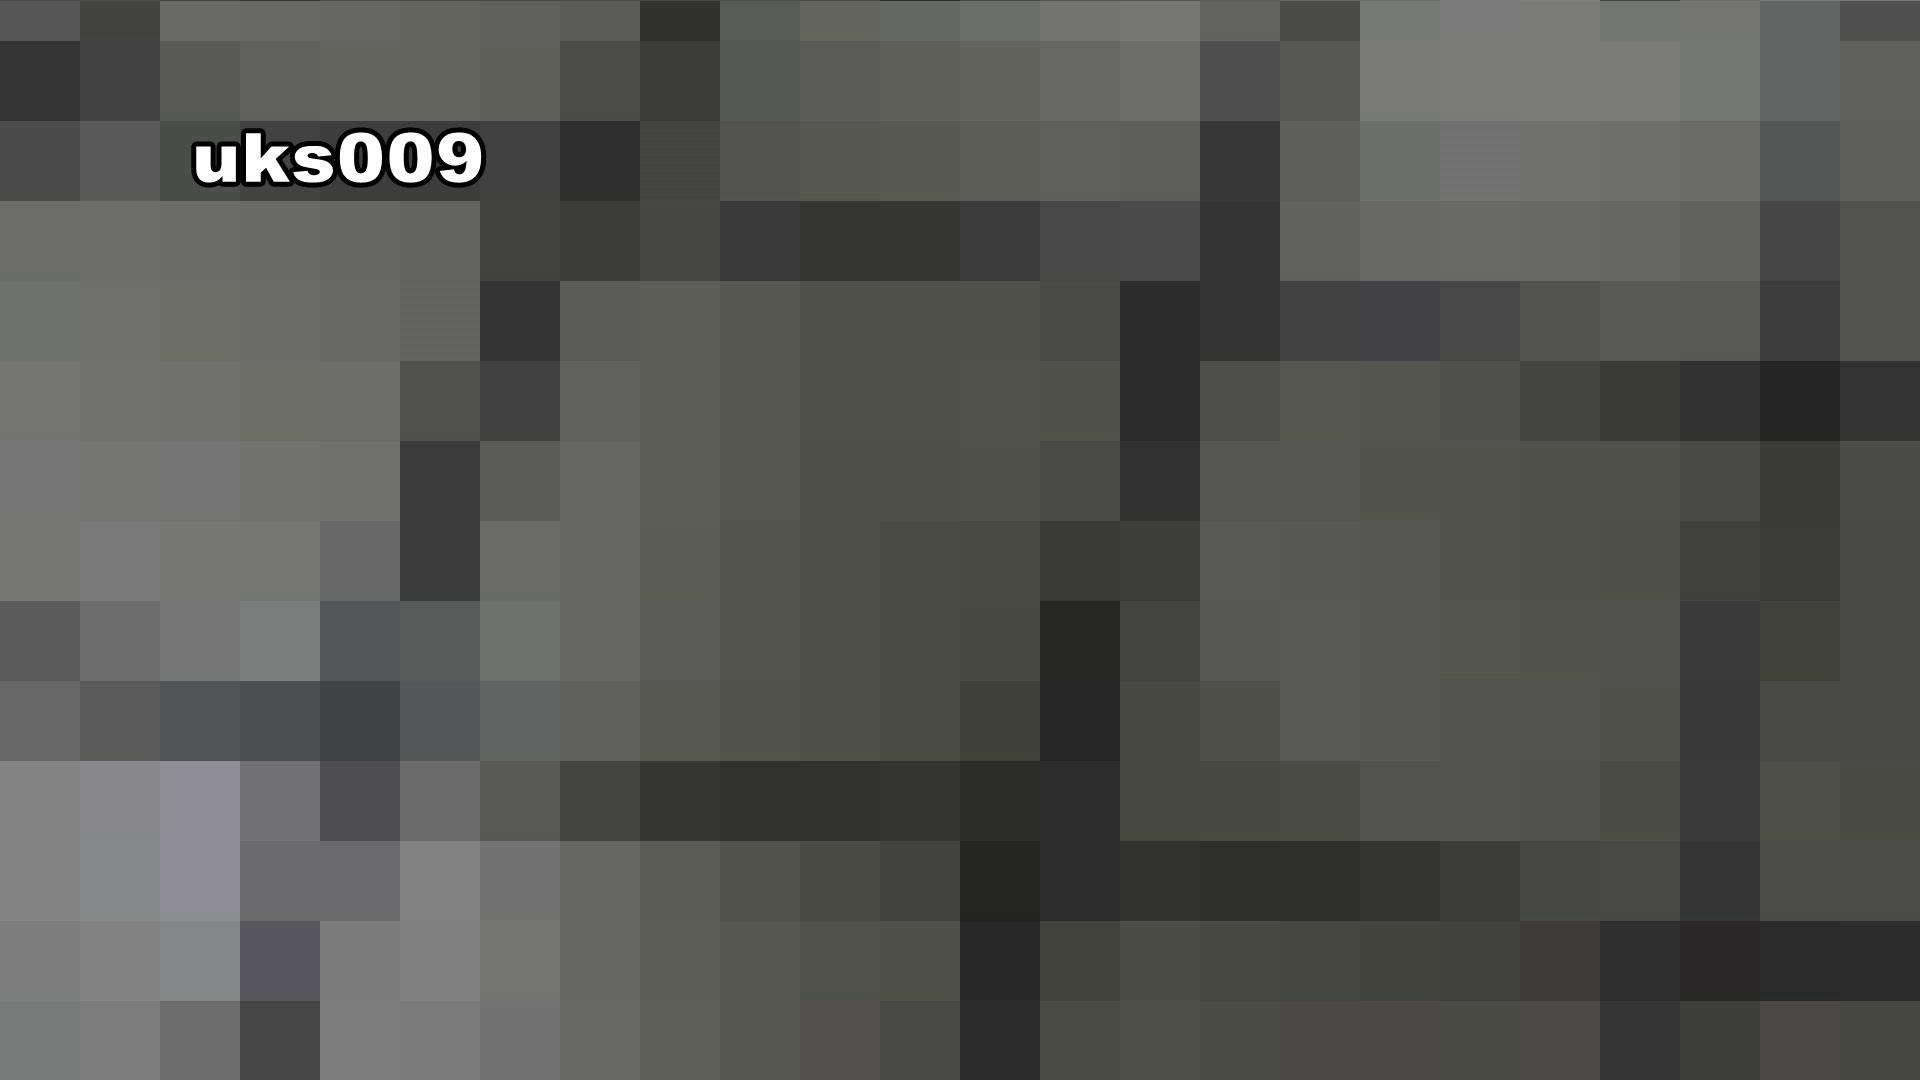 洗面所特攻隊 vol.009 丸見え セックス無修正動画無料 82枚 26